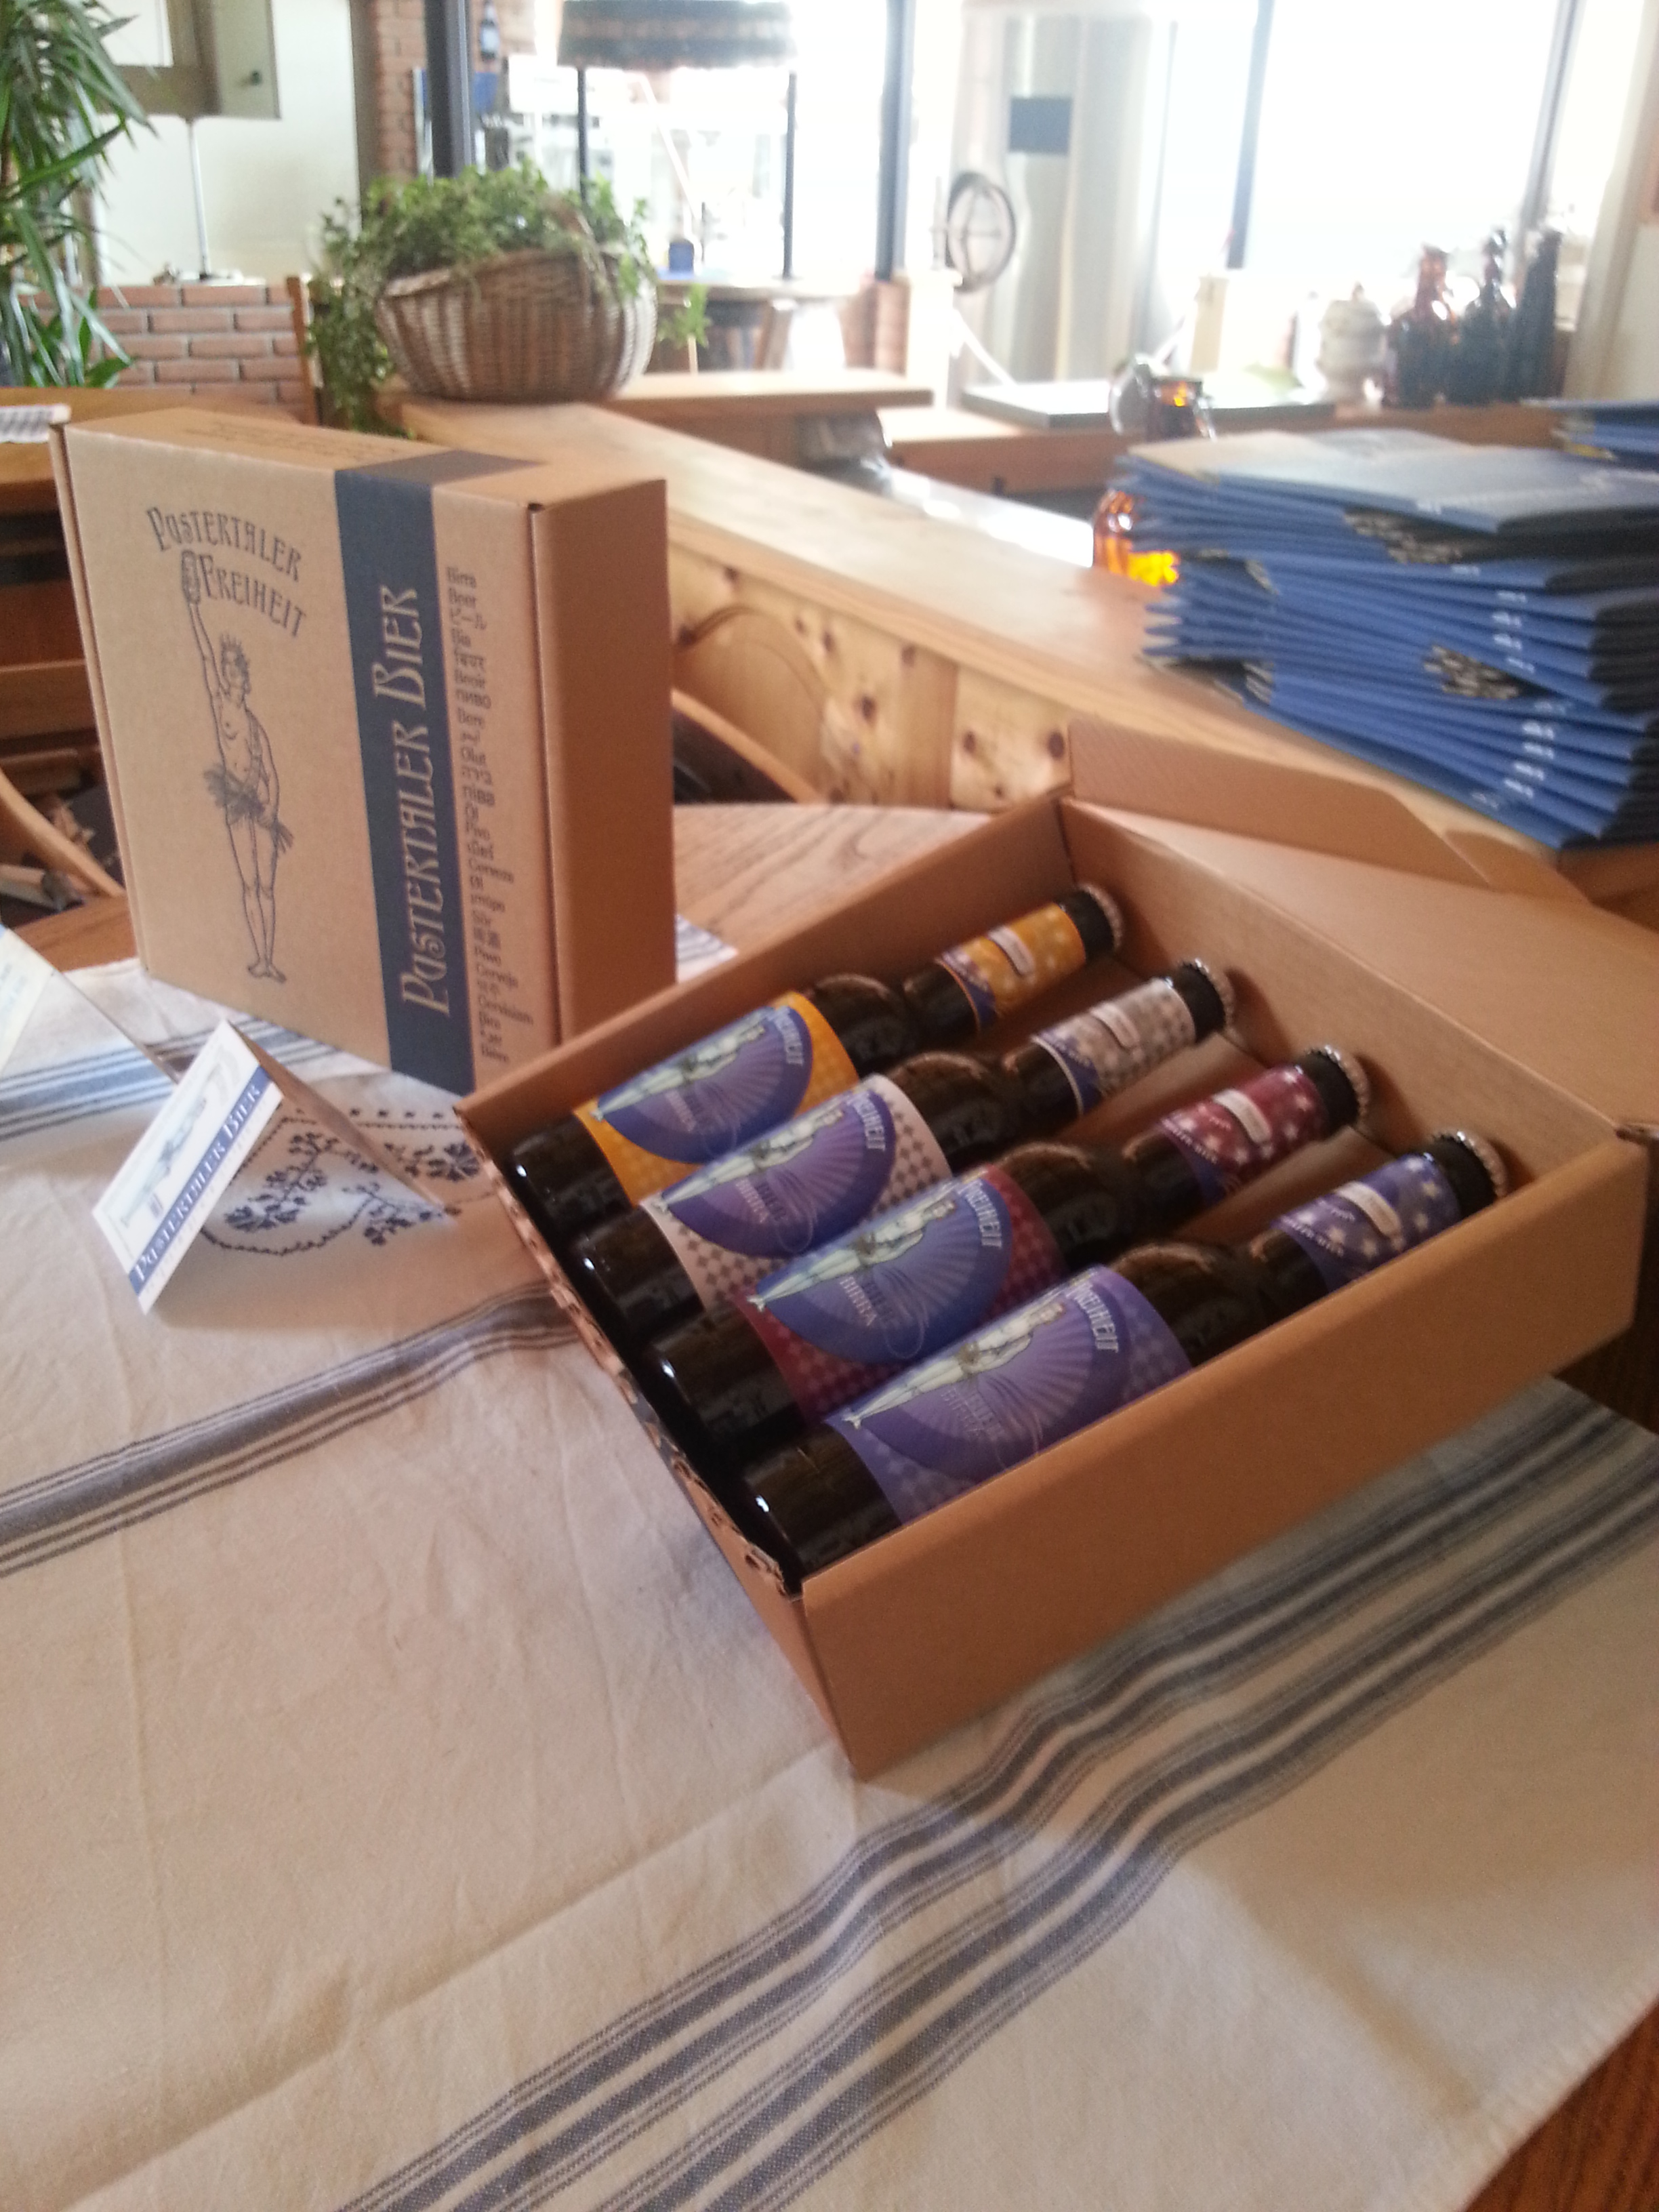 La montagna in bottiglia: La PustertalerFreiheit di Villabassa